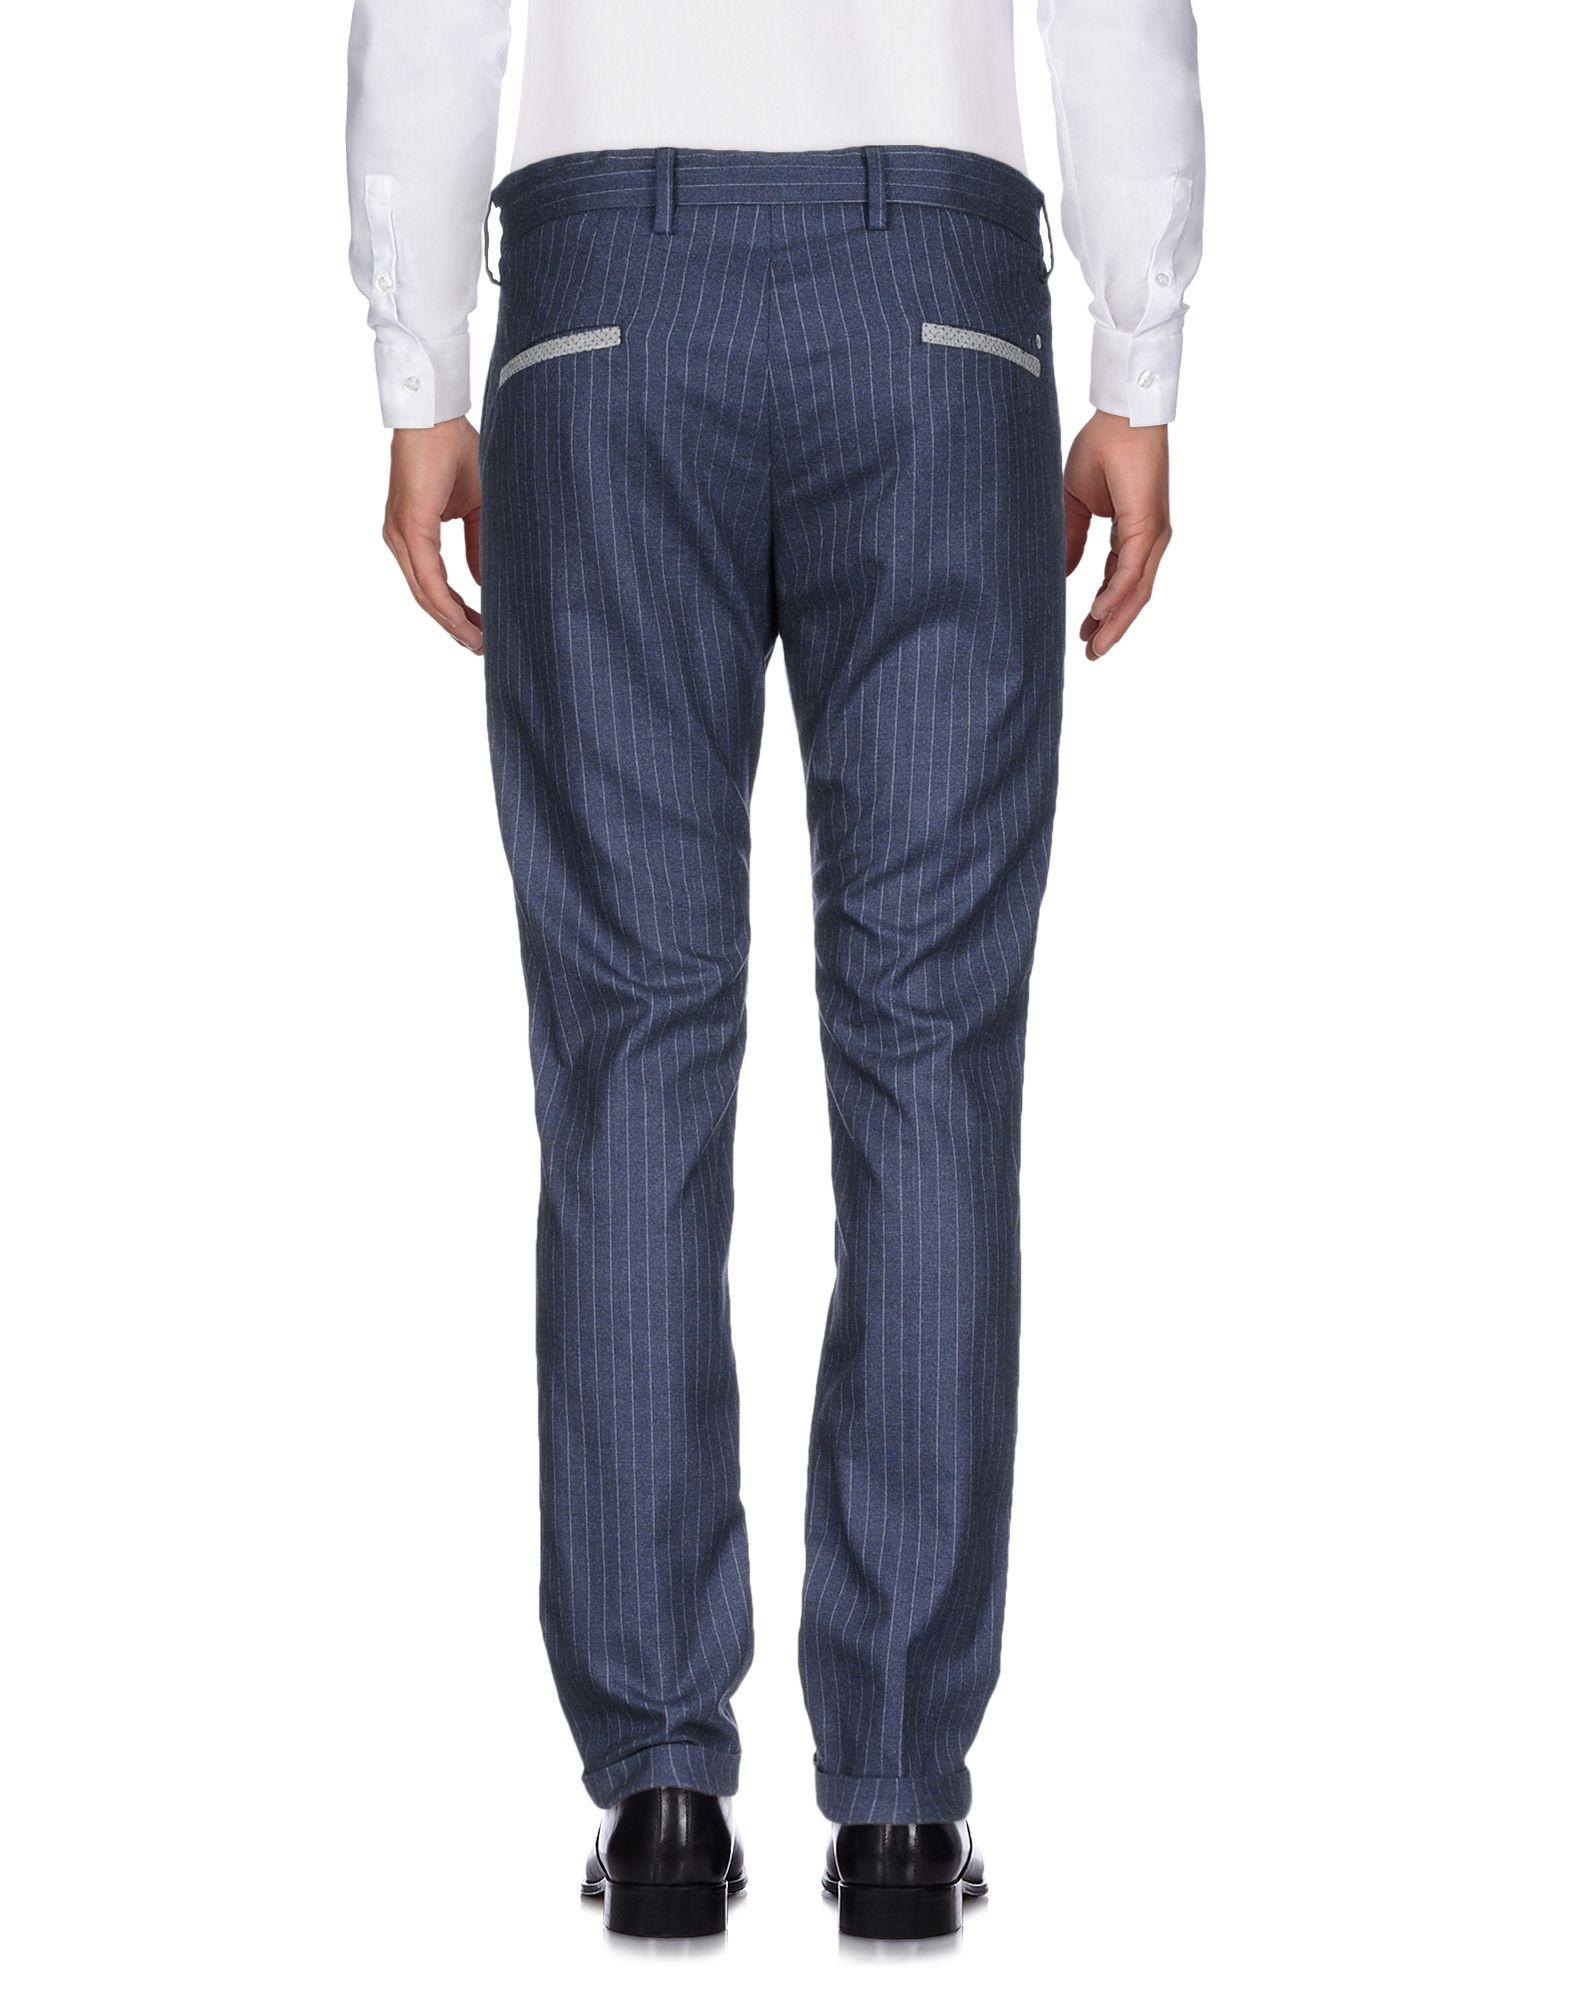 Pantalone Martin Uomo Zelo Uomo Martin - 13195582LF 358013